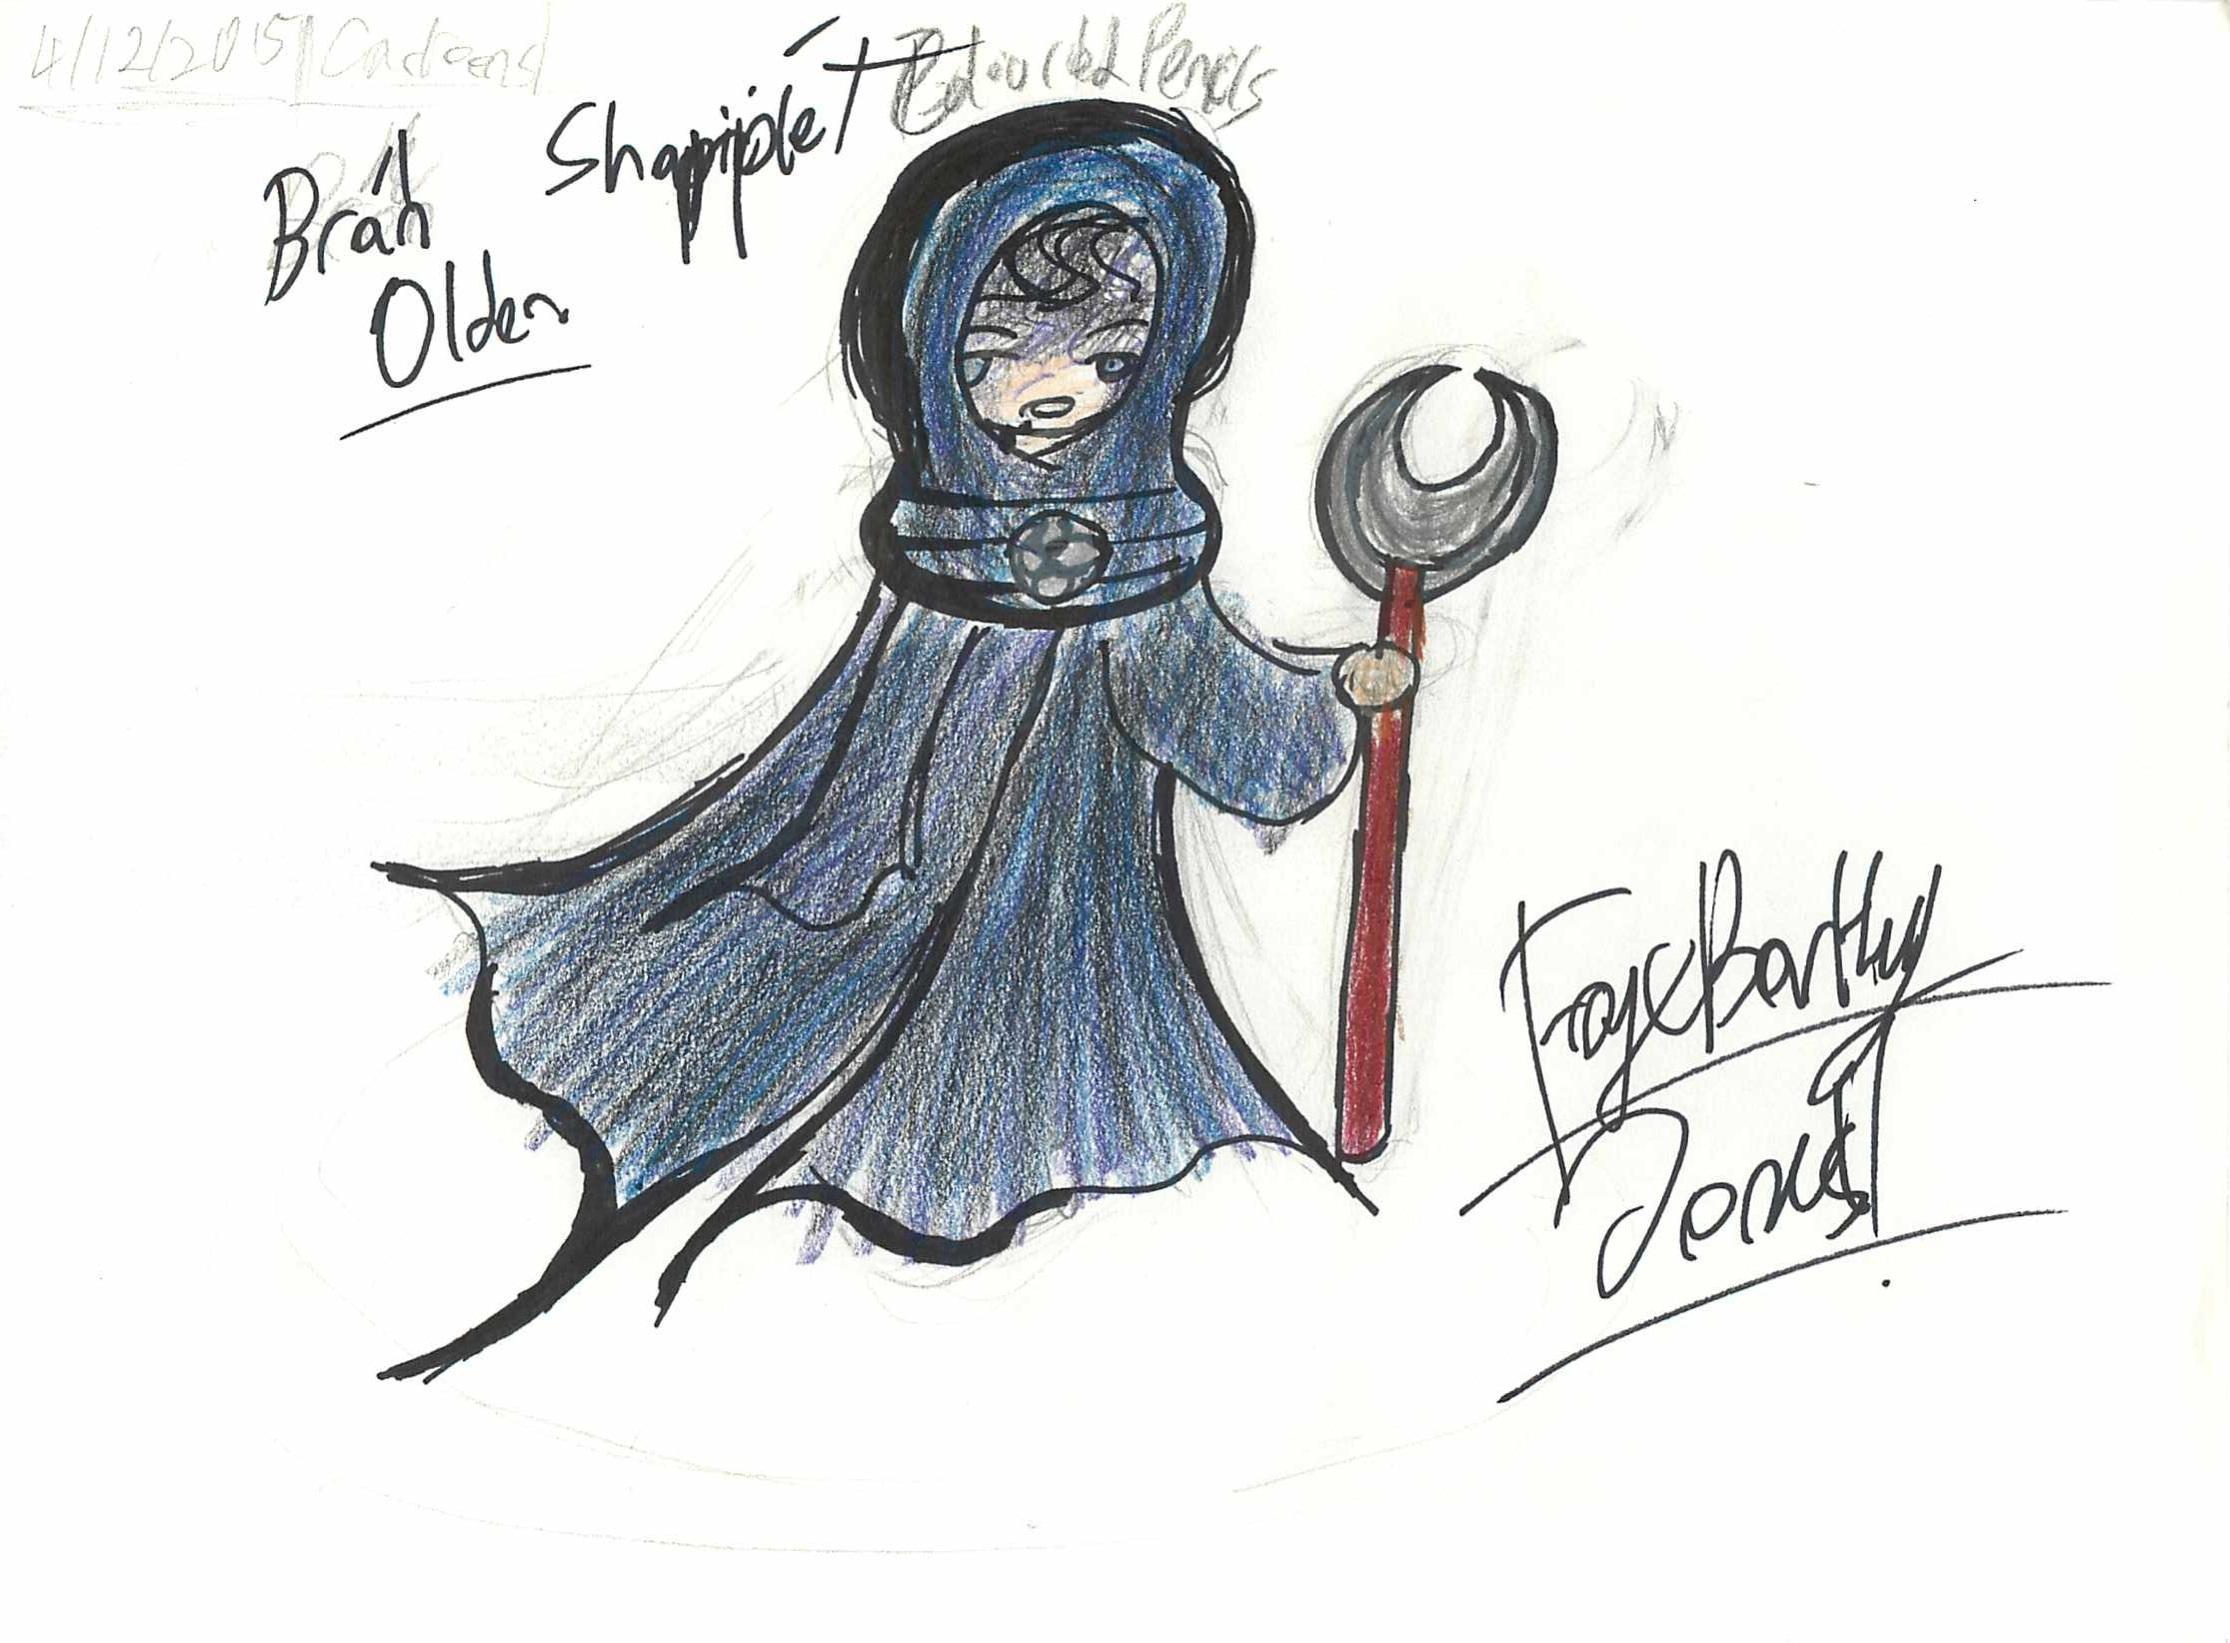 Concept Art of Character, Bran